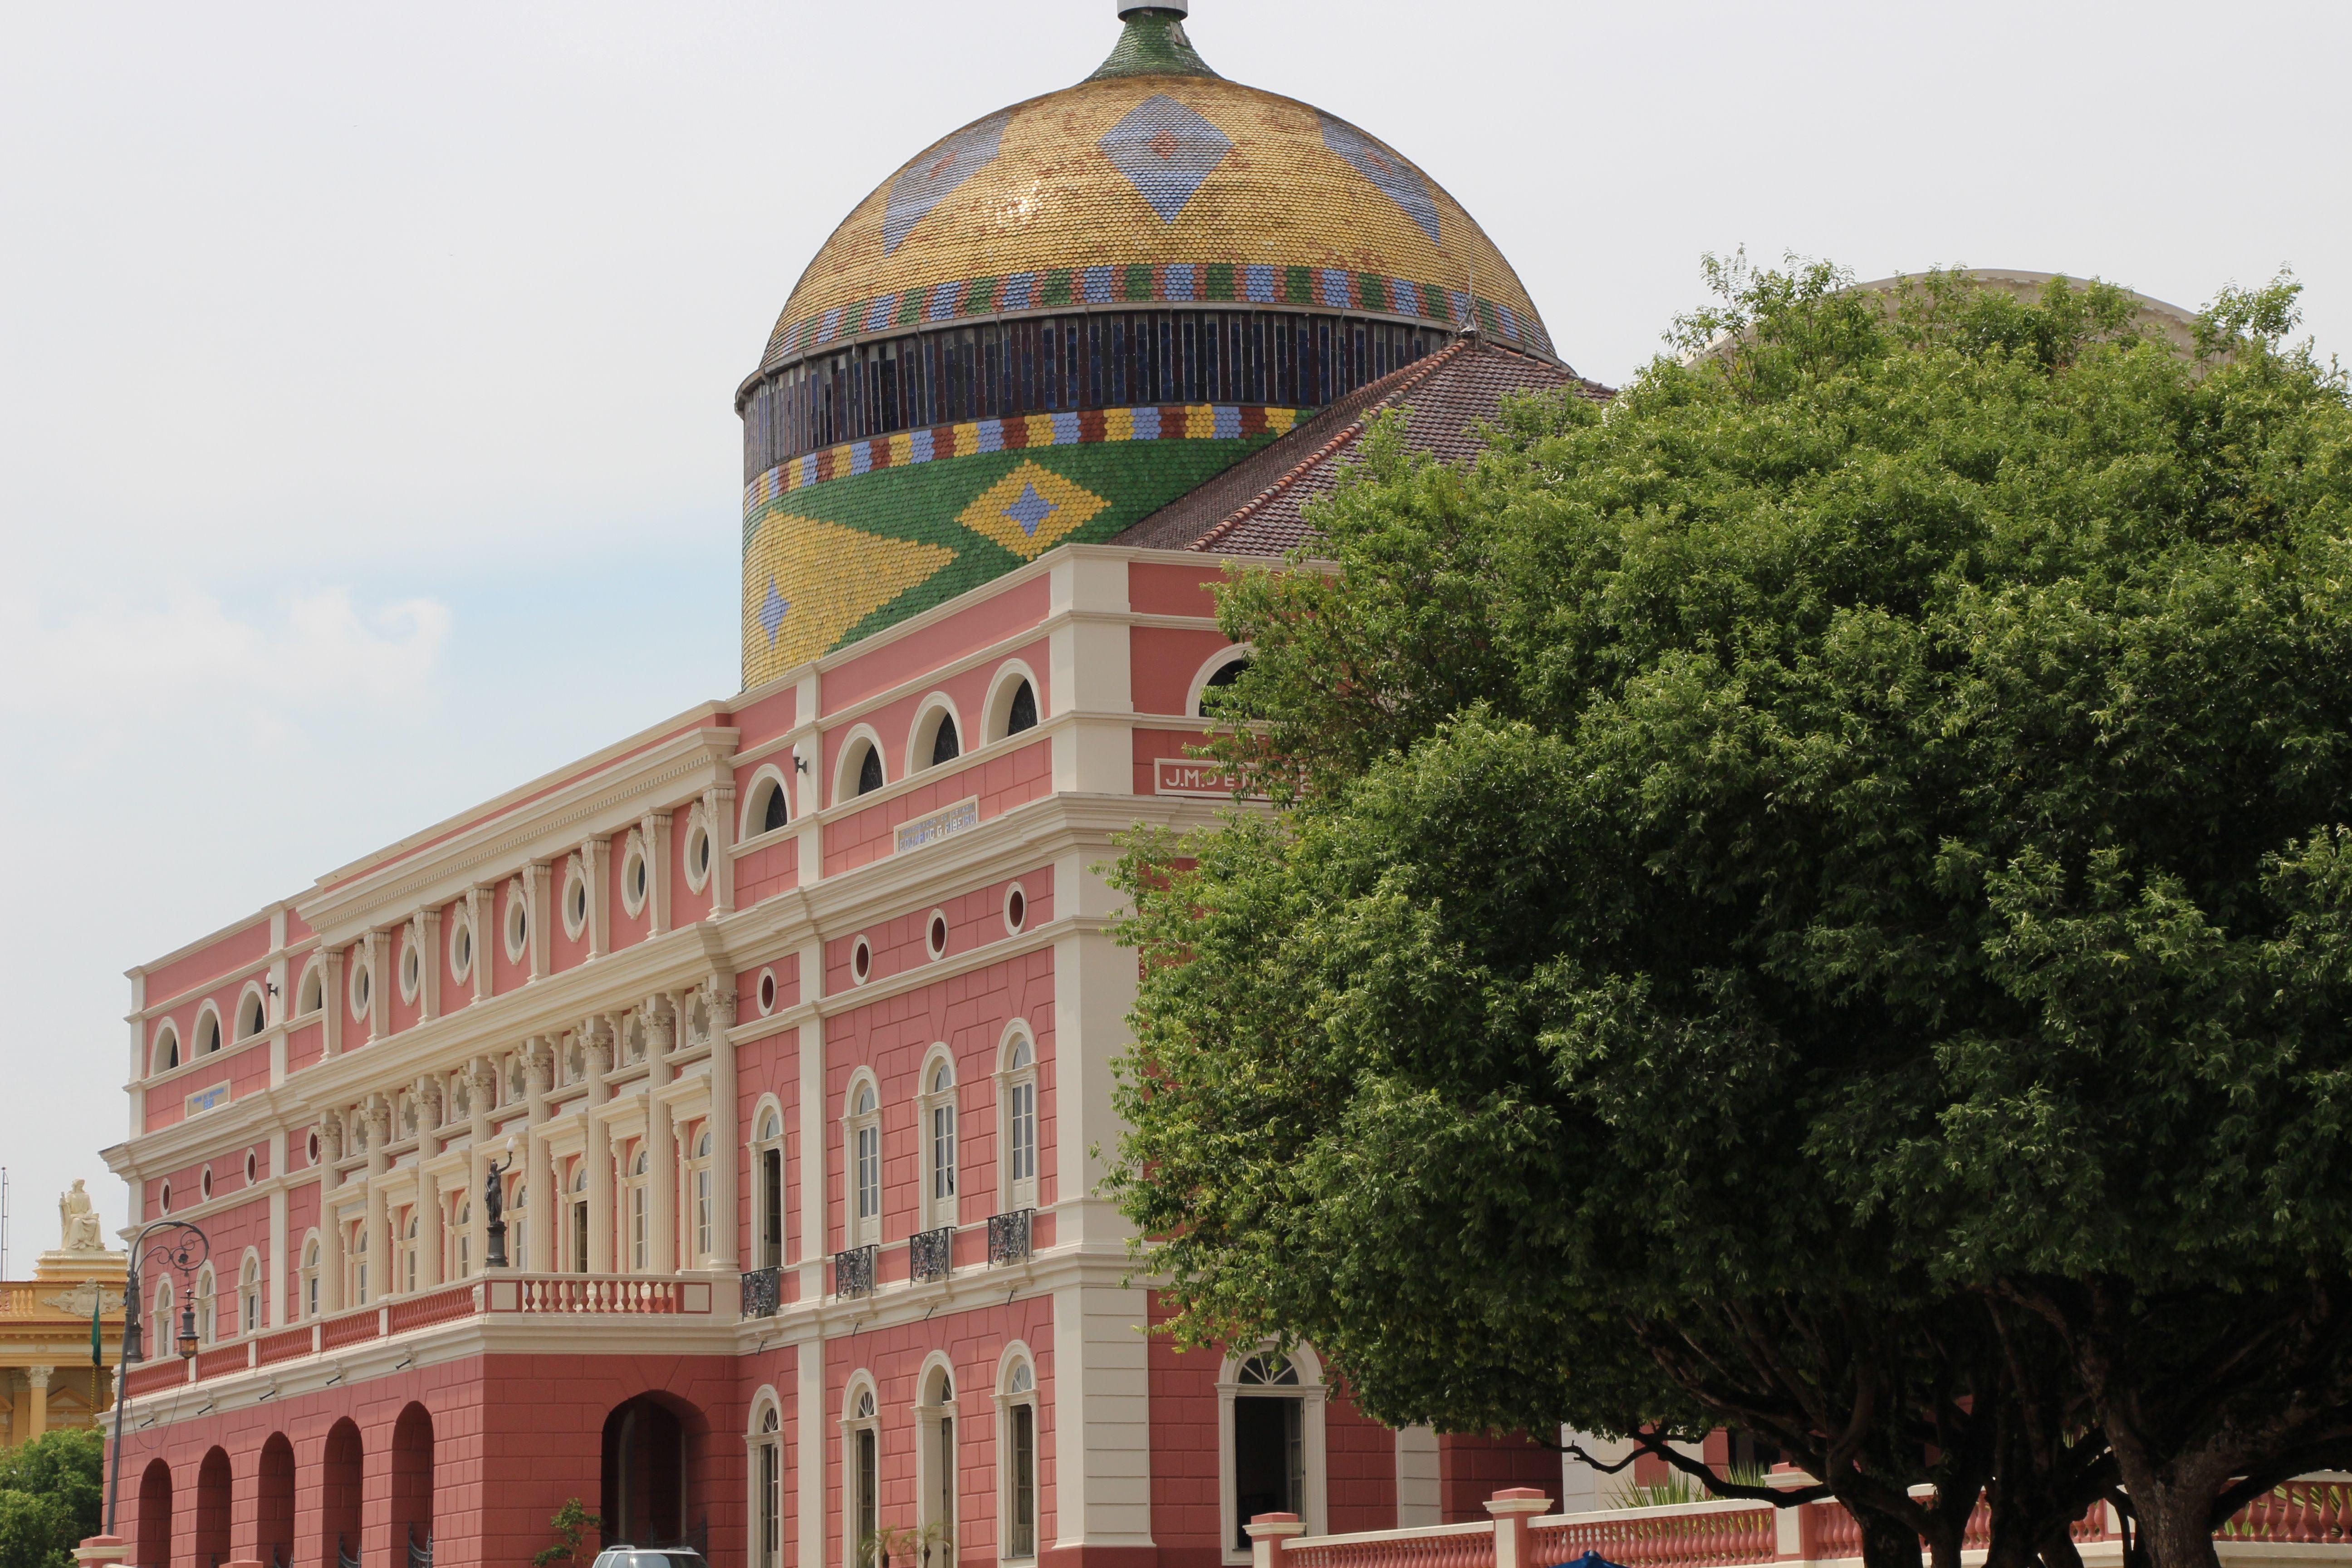 Teatro Amazonas de Manaus